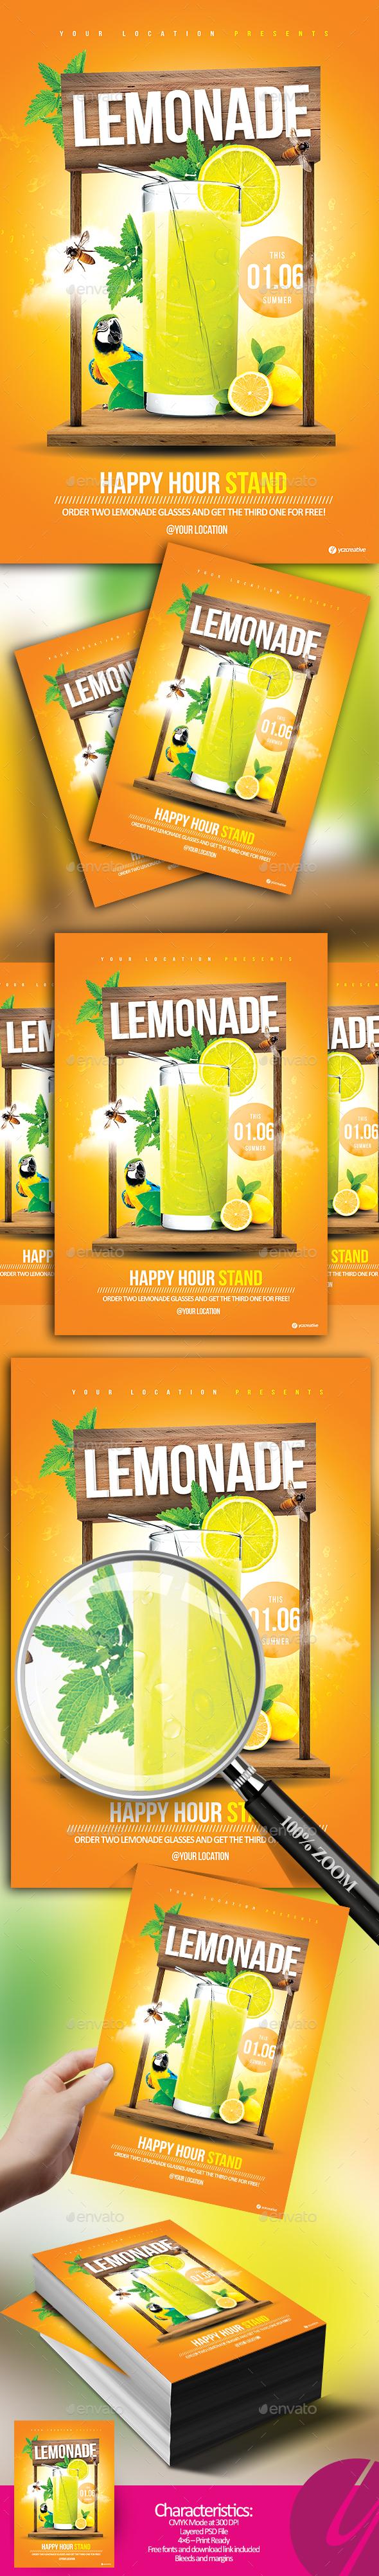 Lemonade Stand Flyer - Restaurant Flyers